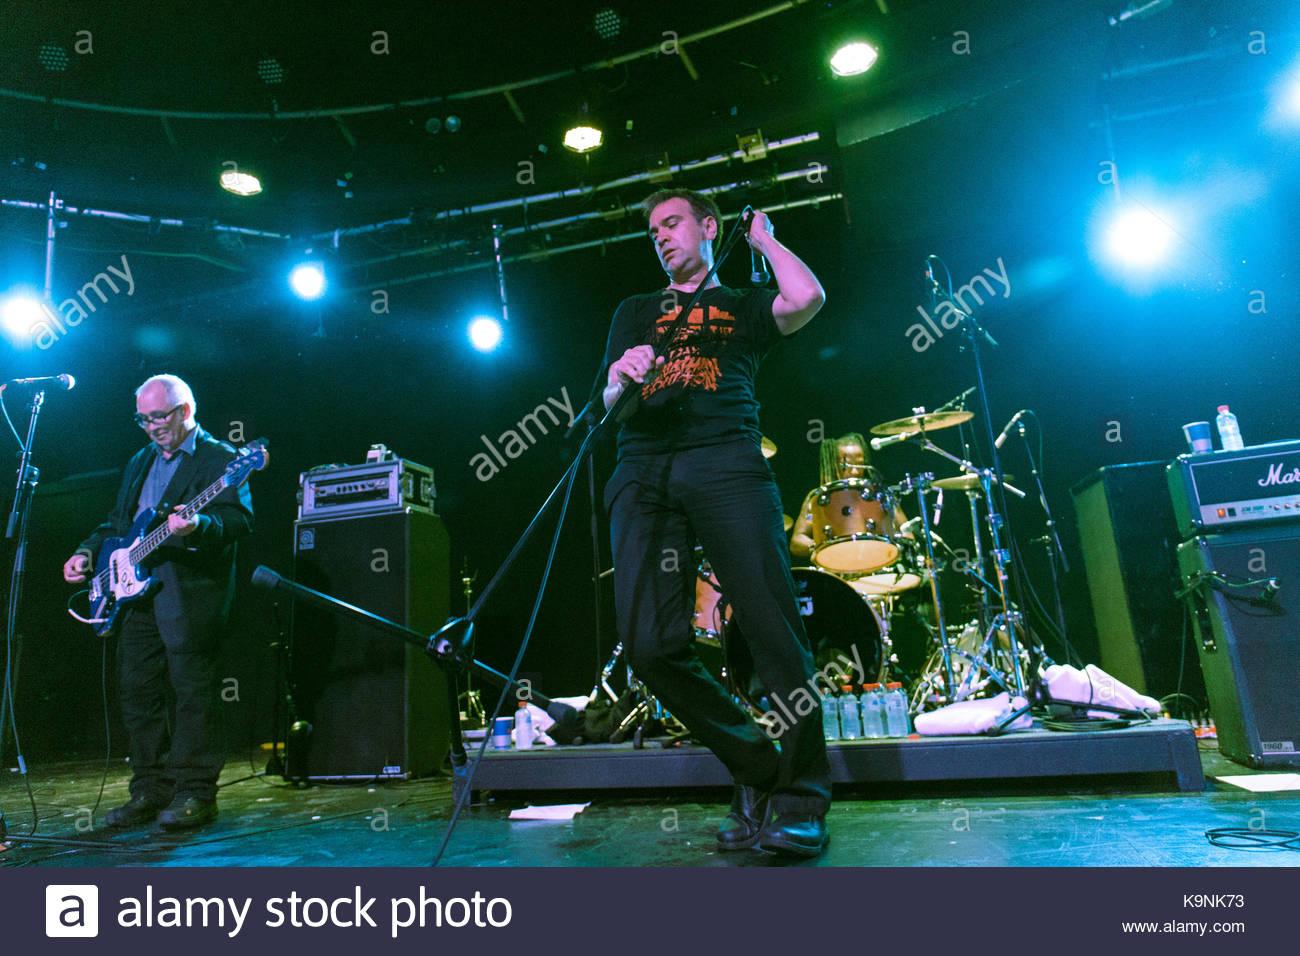 Eastbay hardcore punk